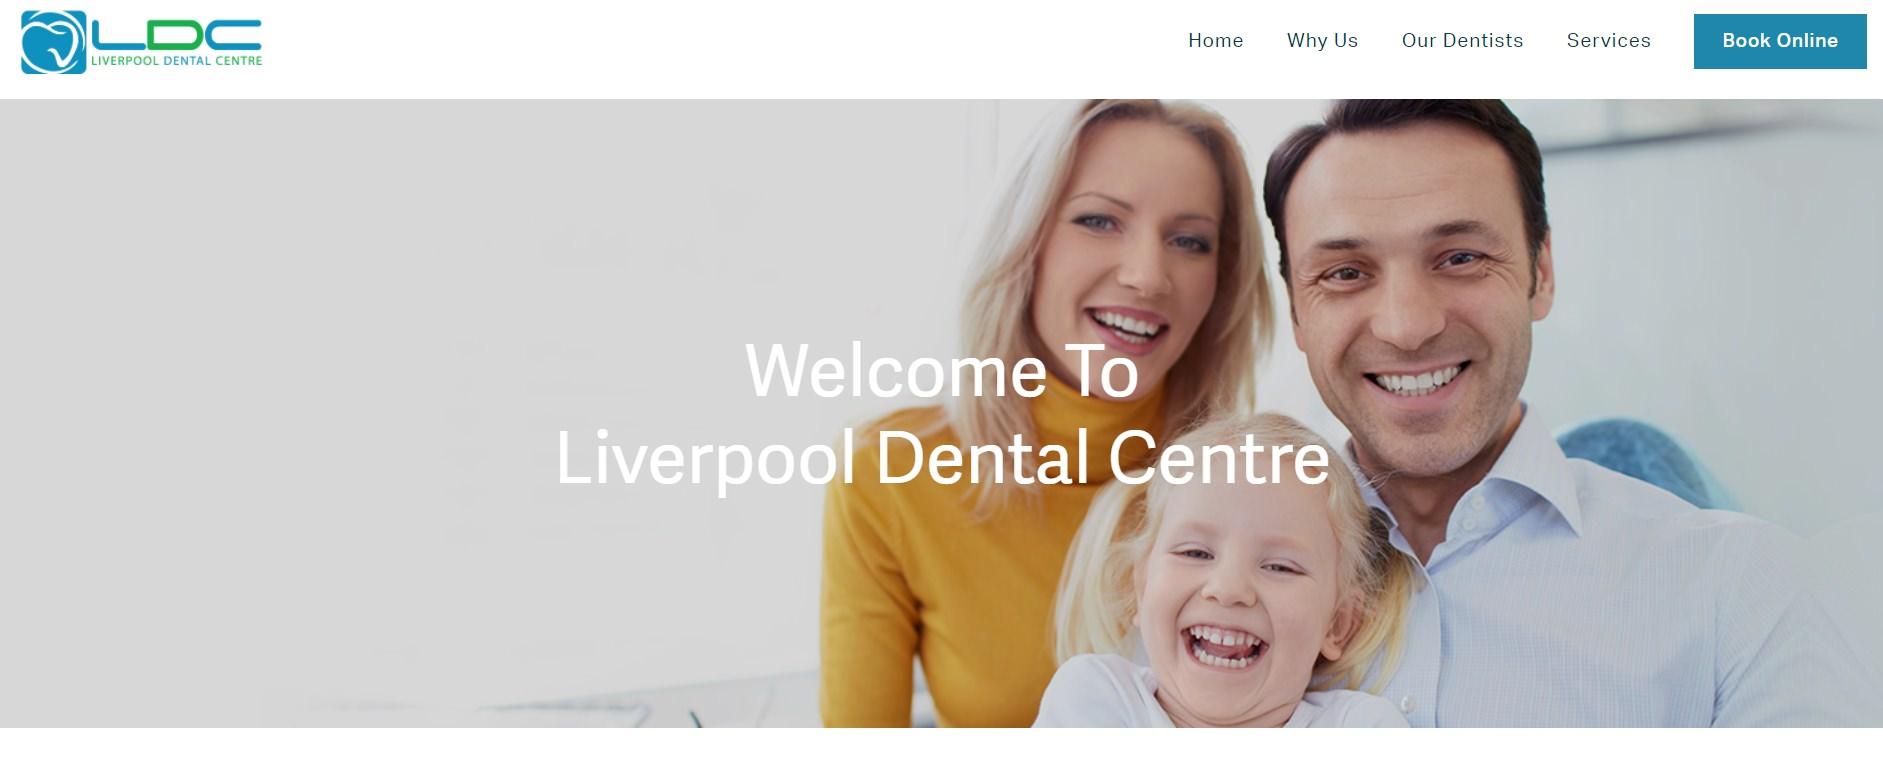 Liverpool Dental Centre screenshot of their website